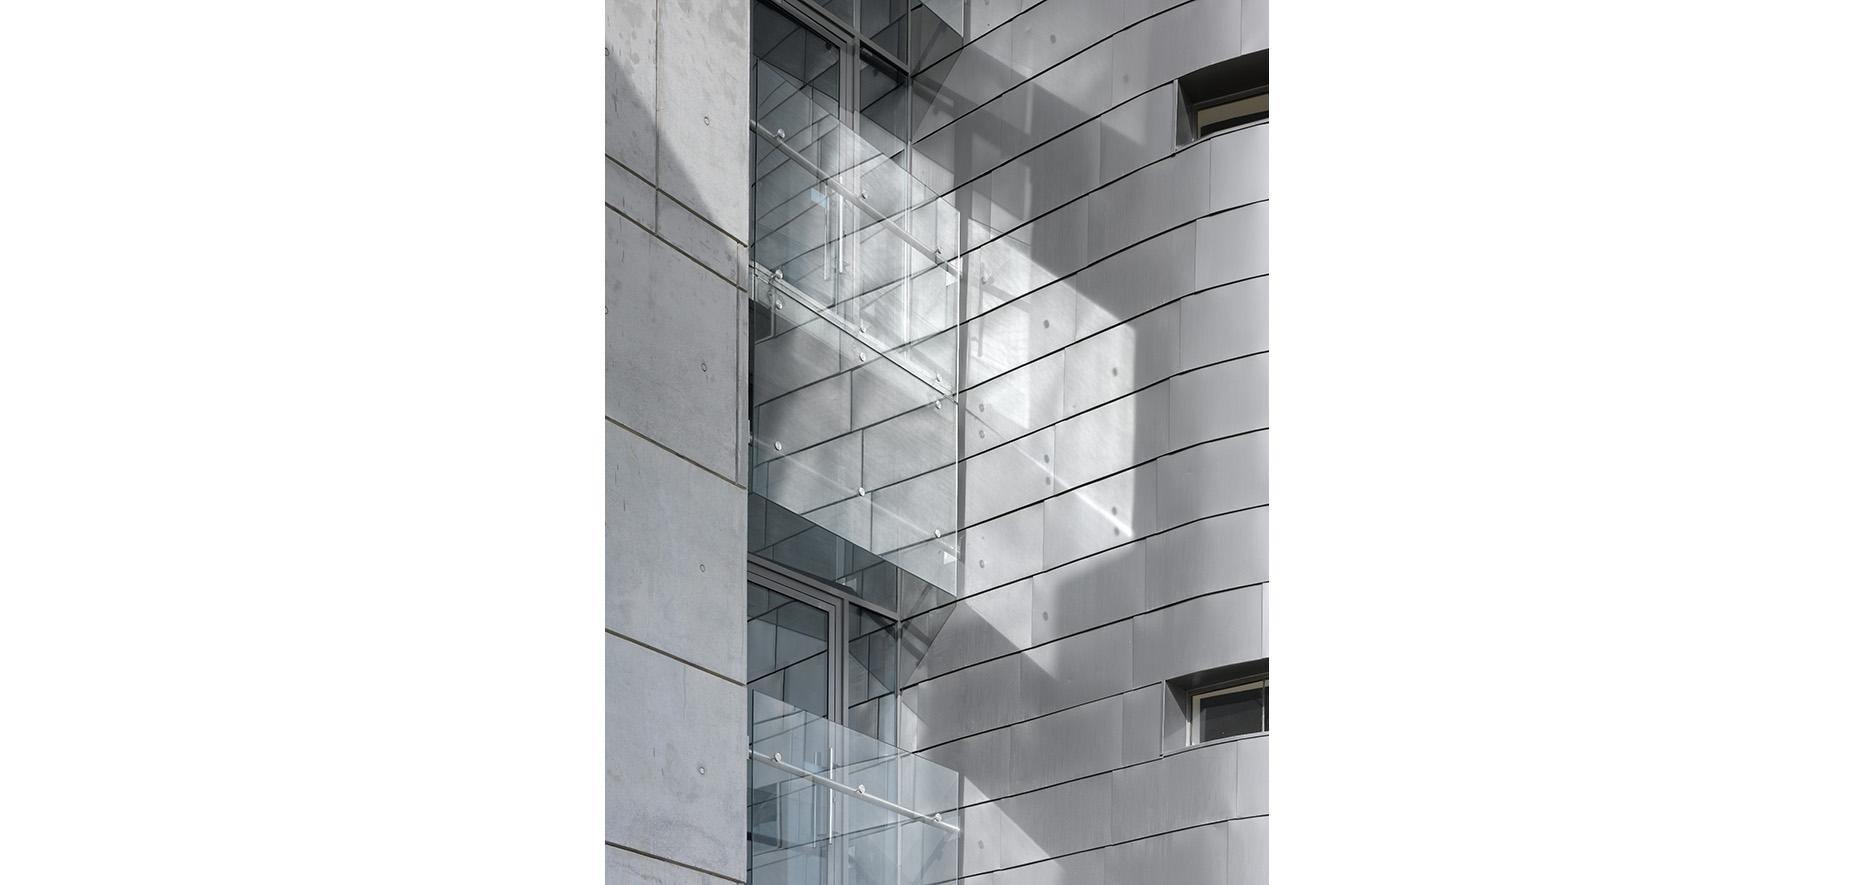 Nano Technologia Science and Technology BGU by Kolker Epstein Architect3